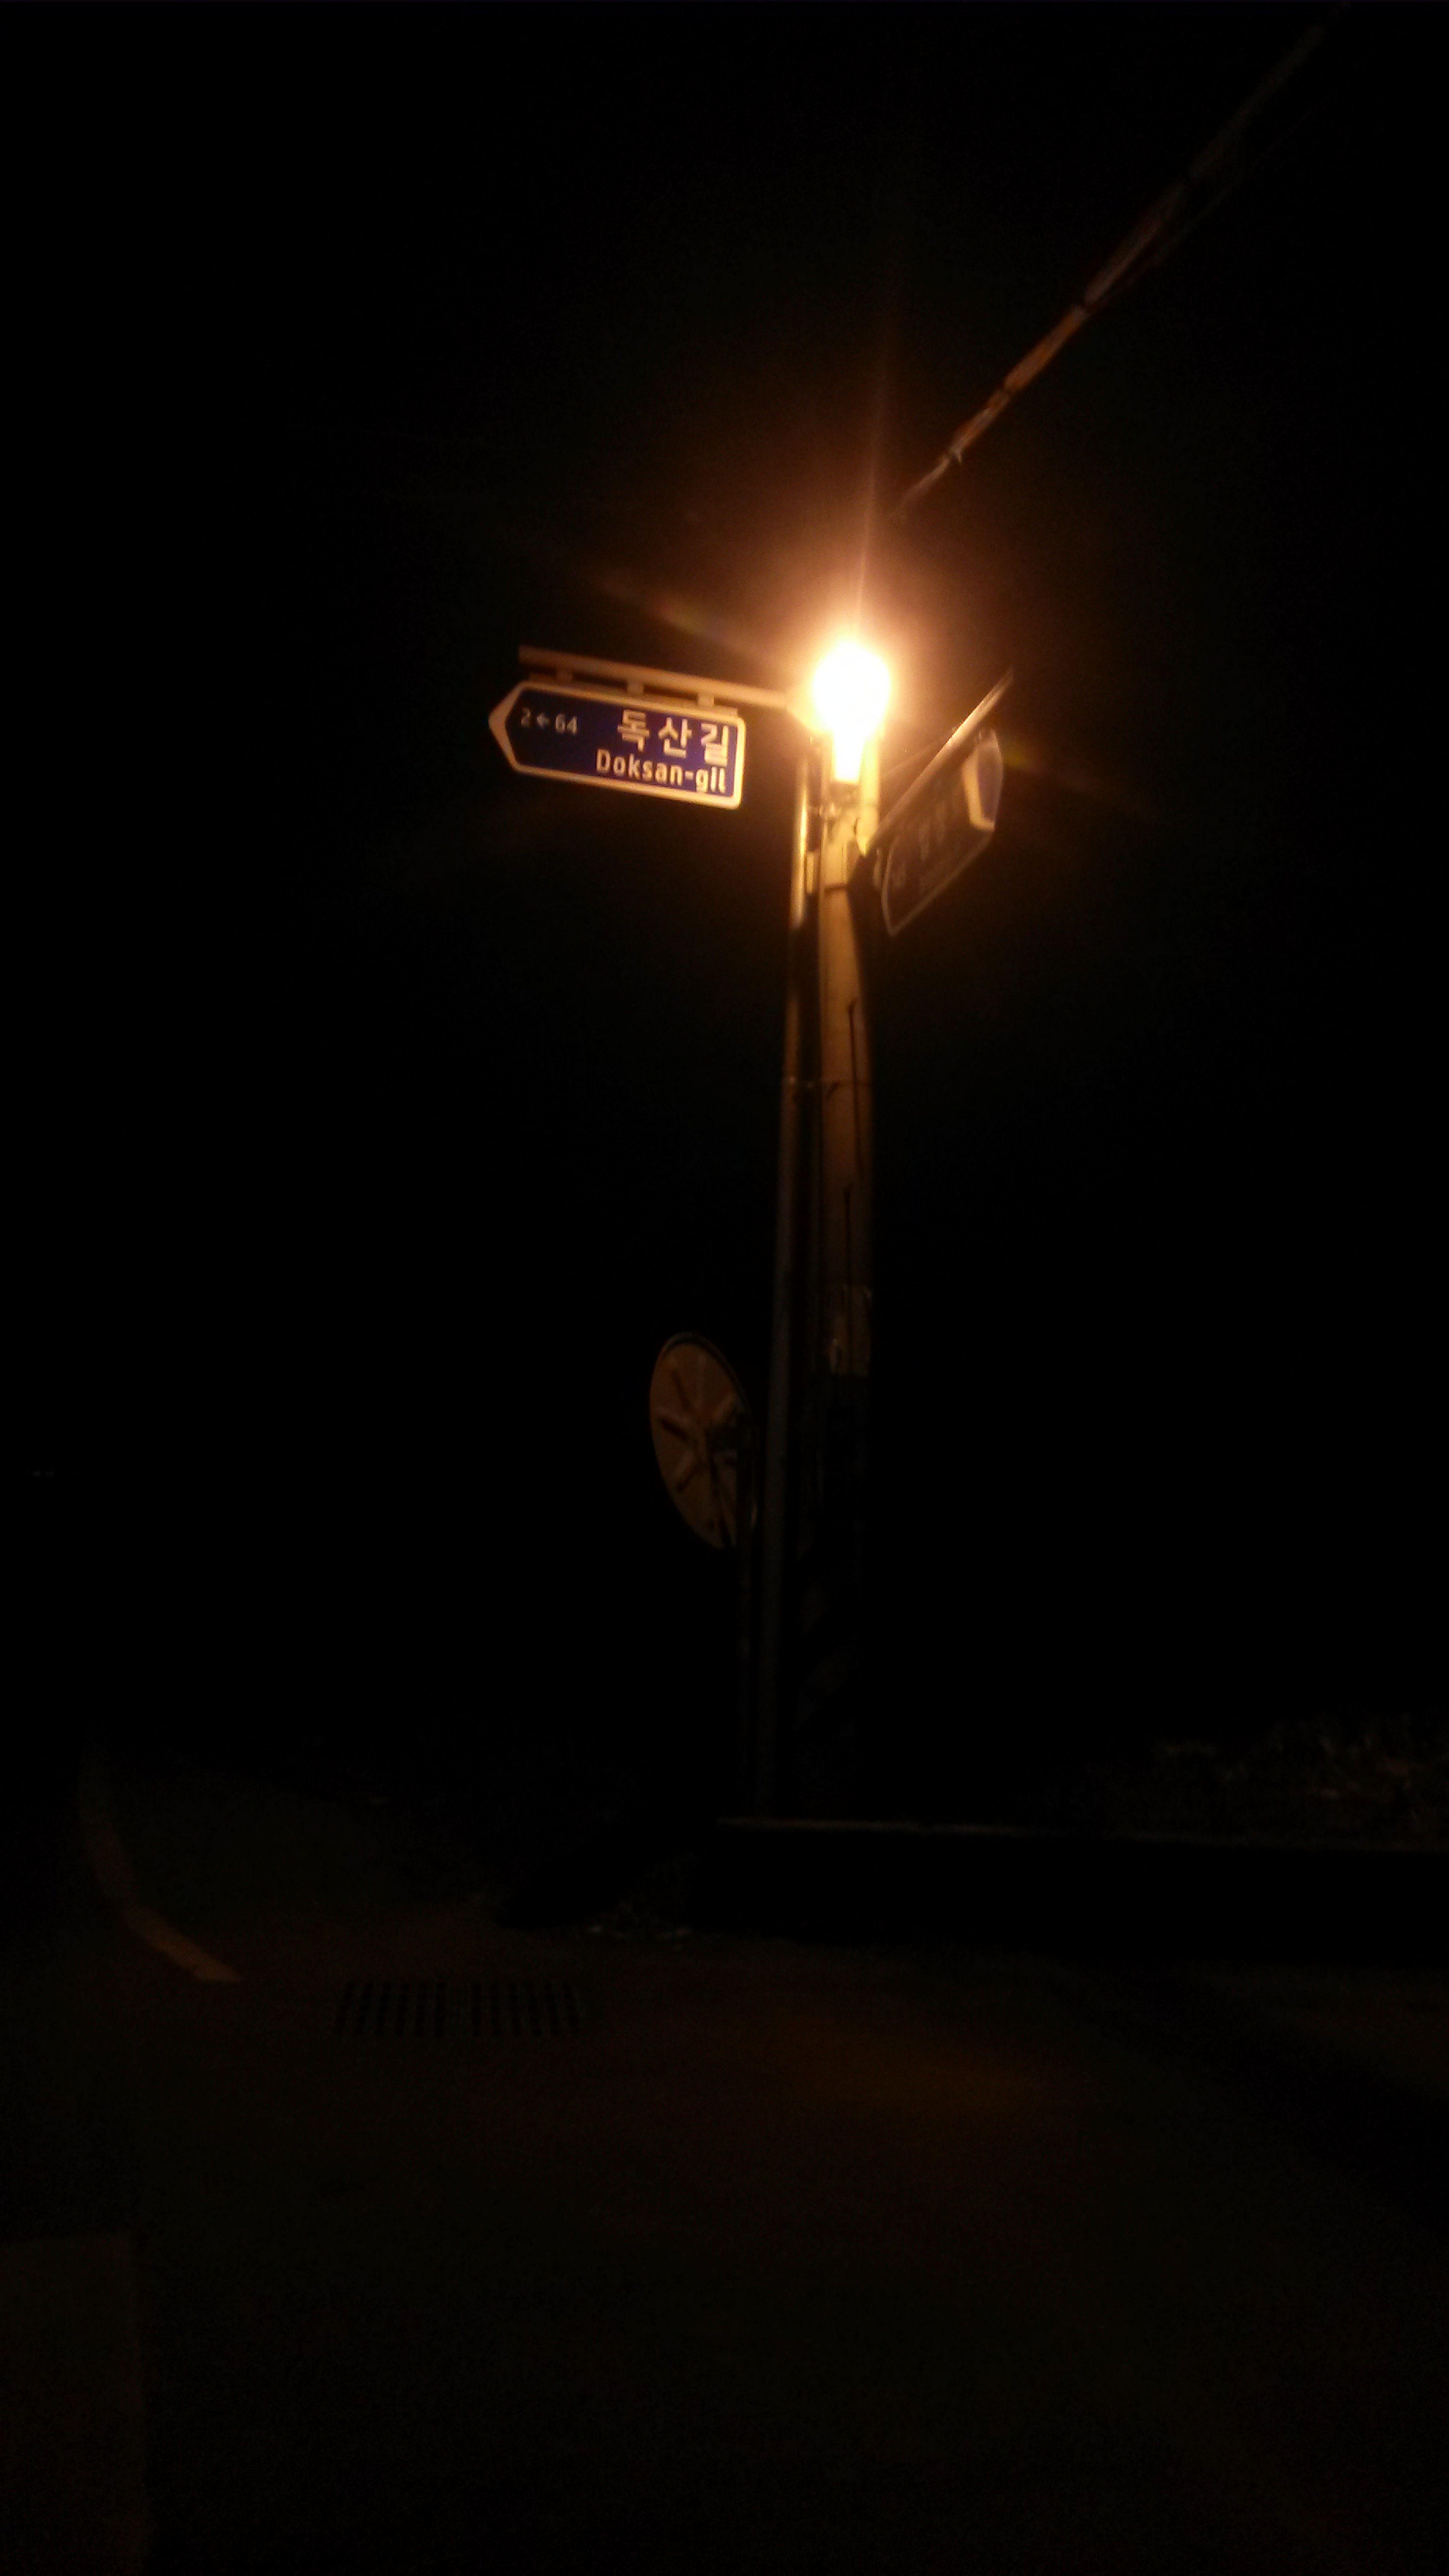 Telephone Pole Street Light